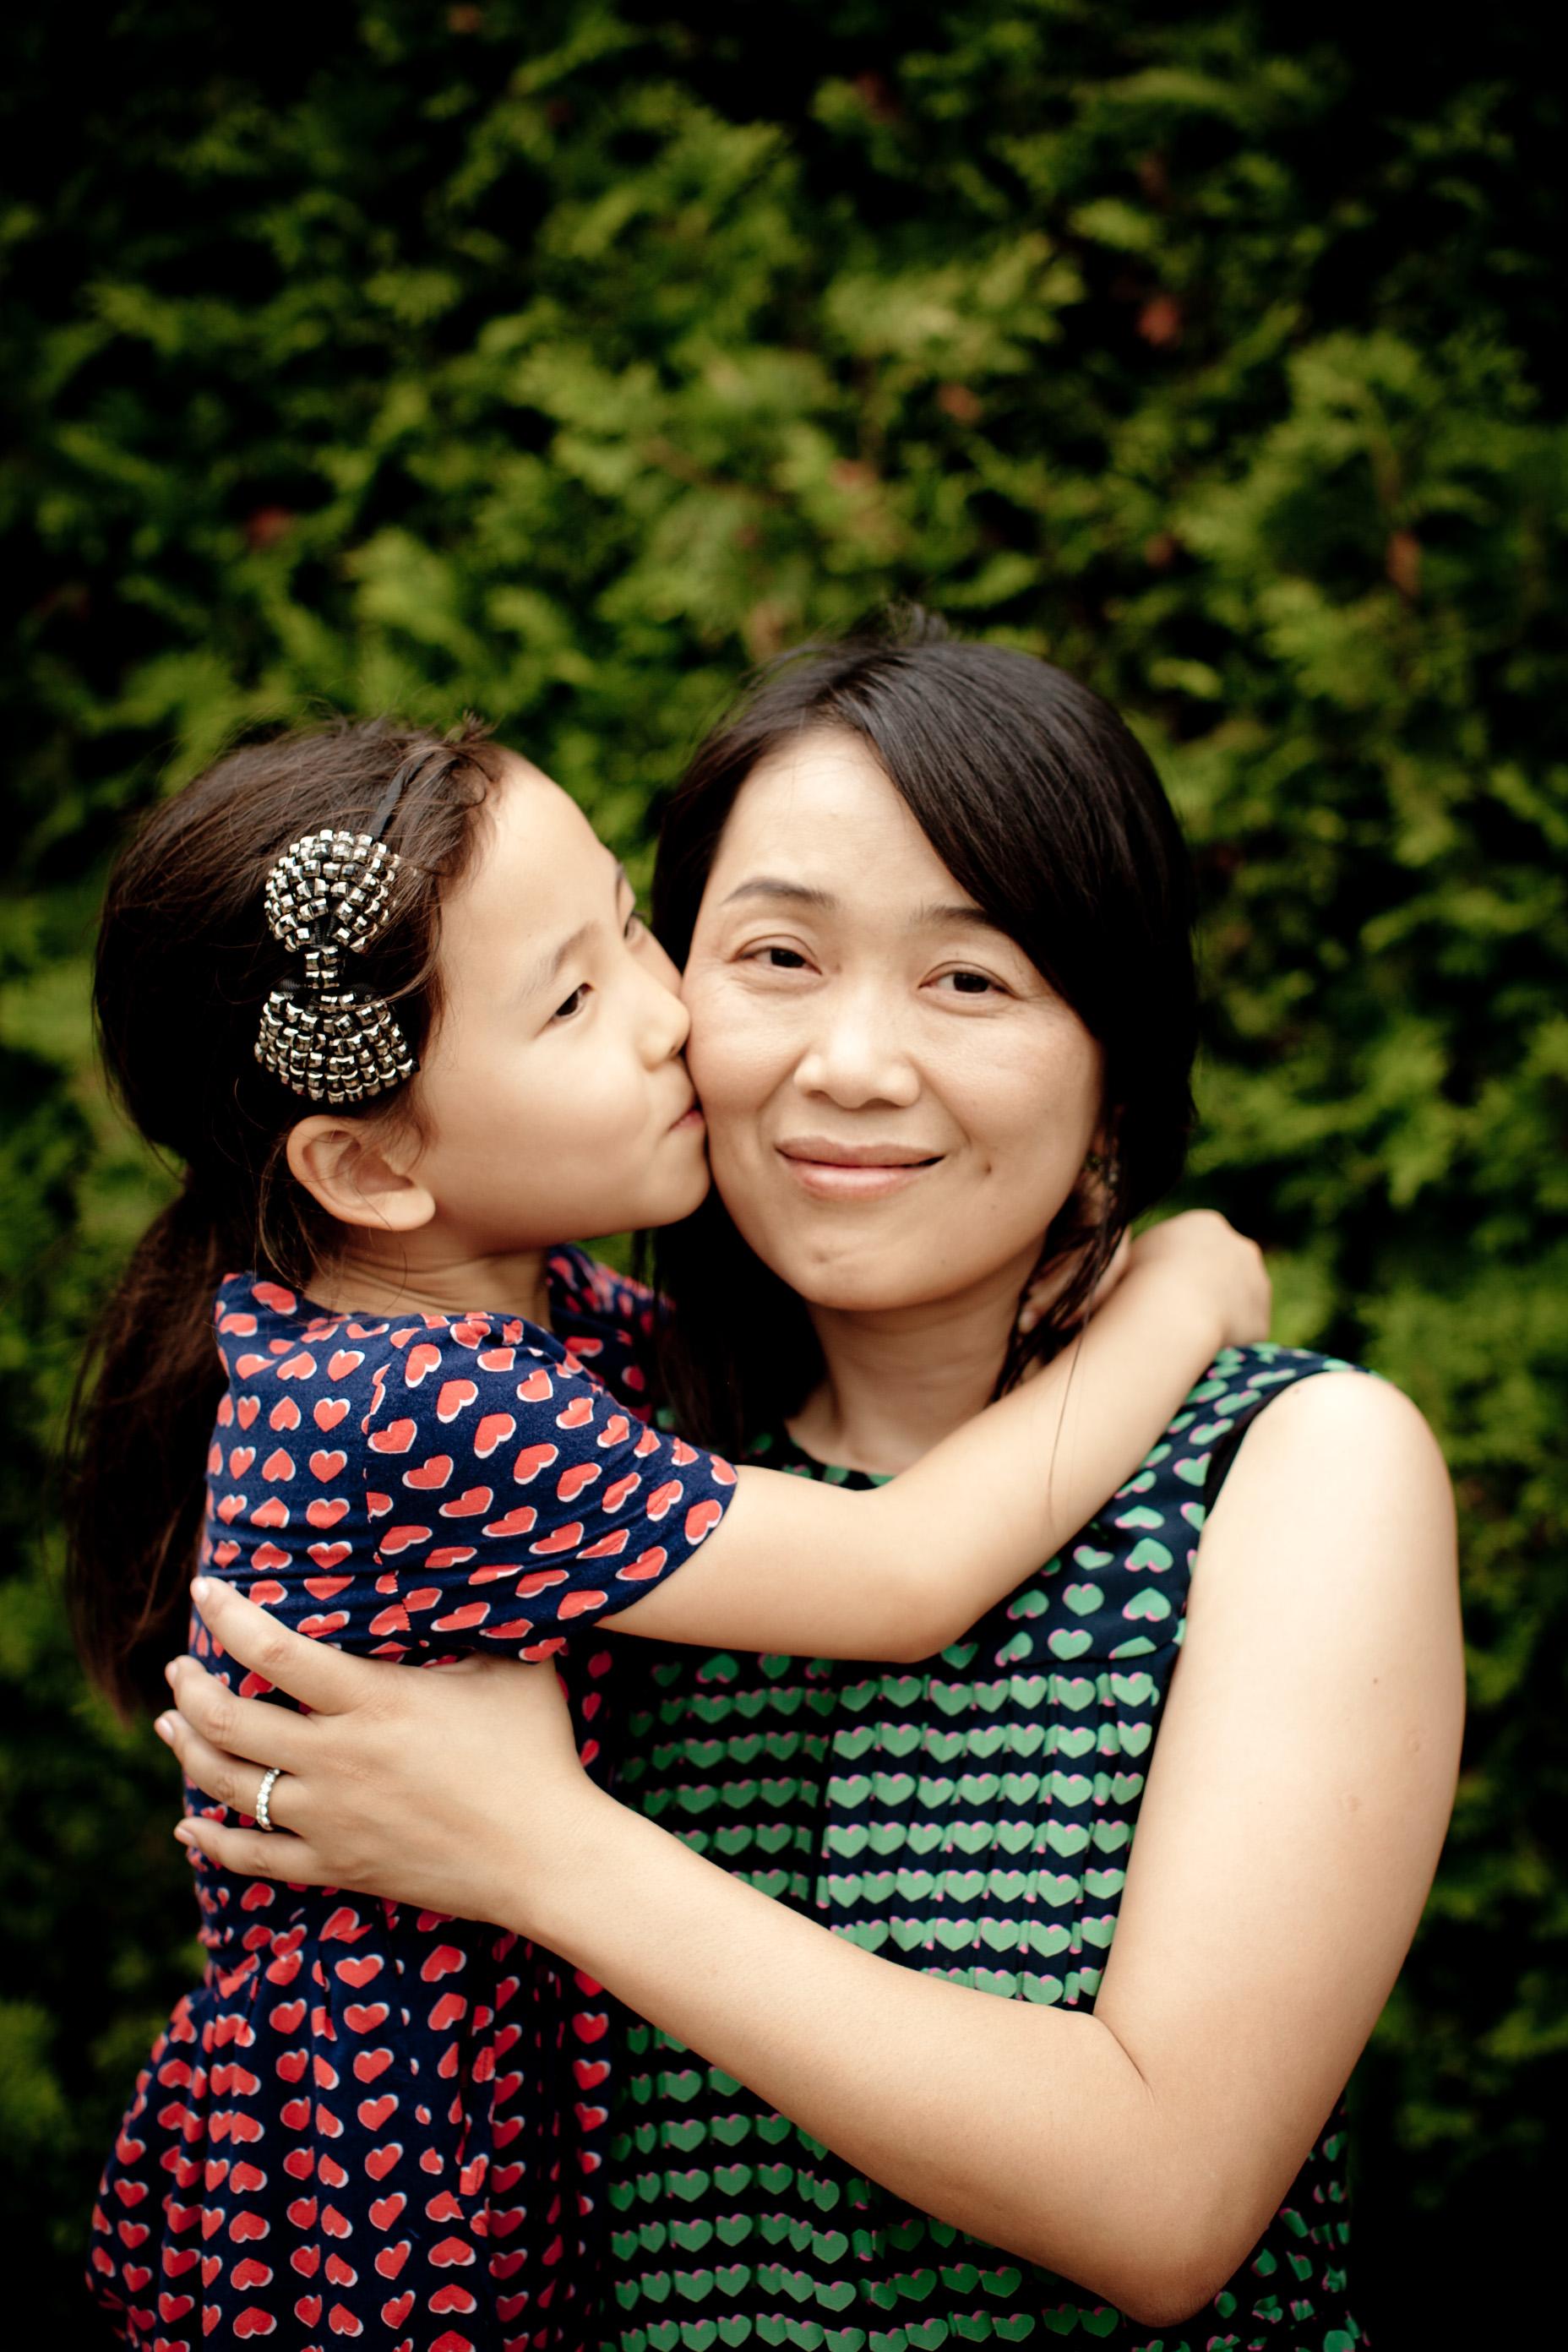 wendi & rudi lifestyle family photo session lurie gardens millenium park chicago blog-0006.jpg